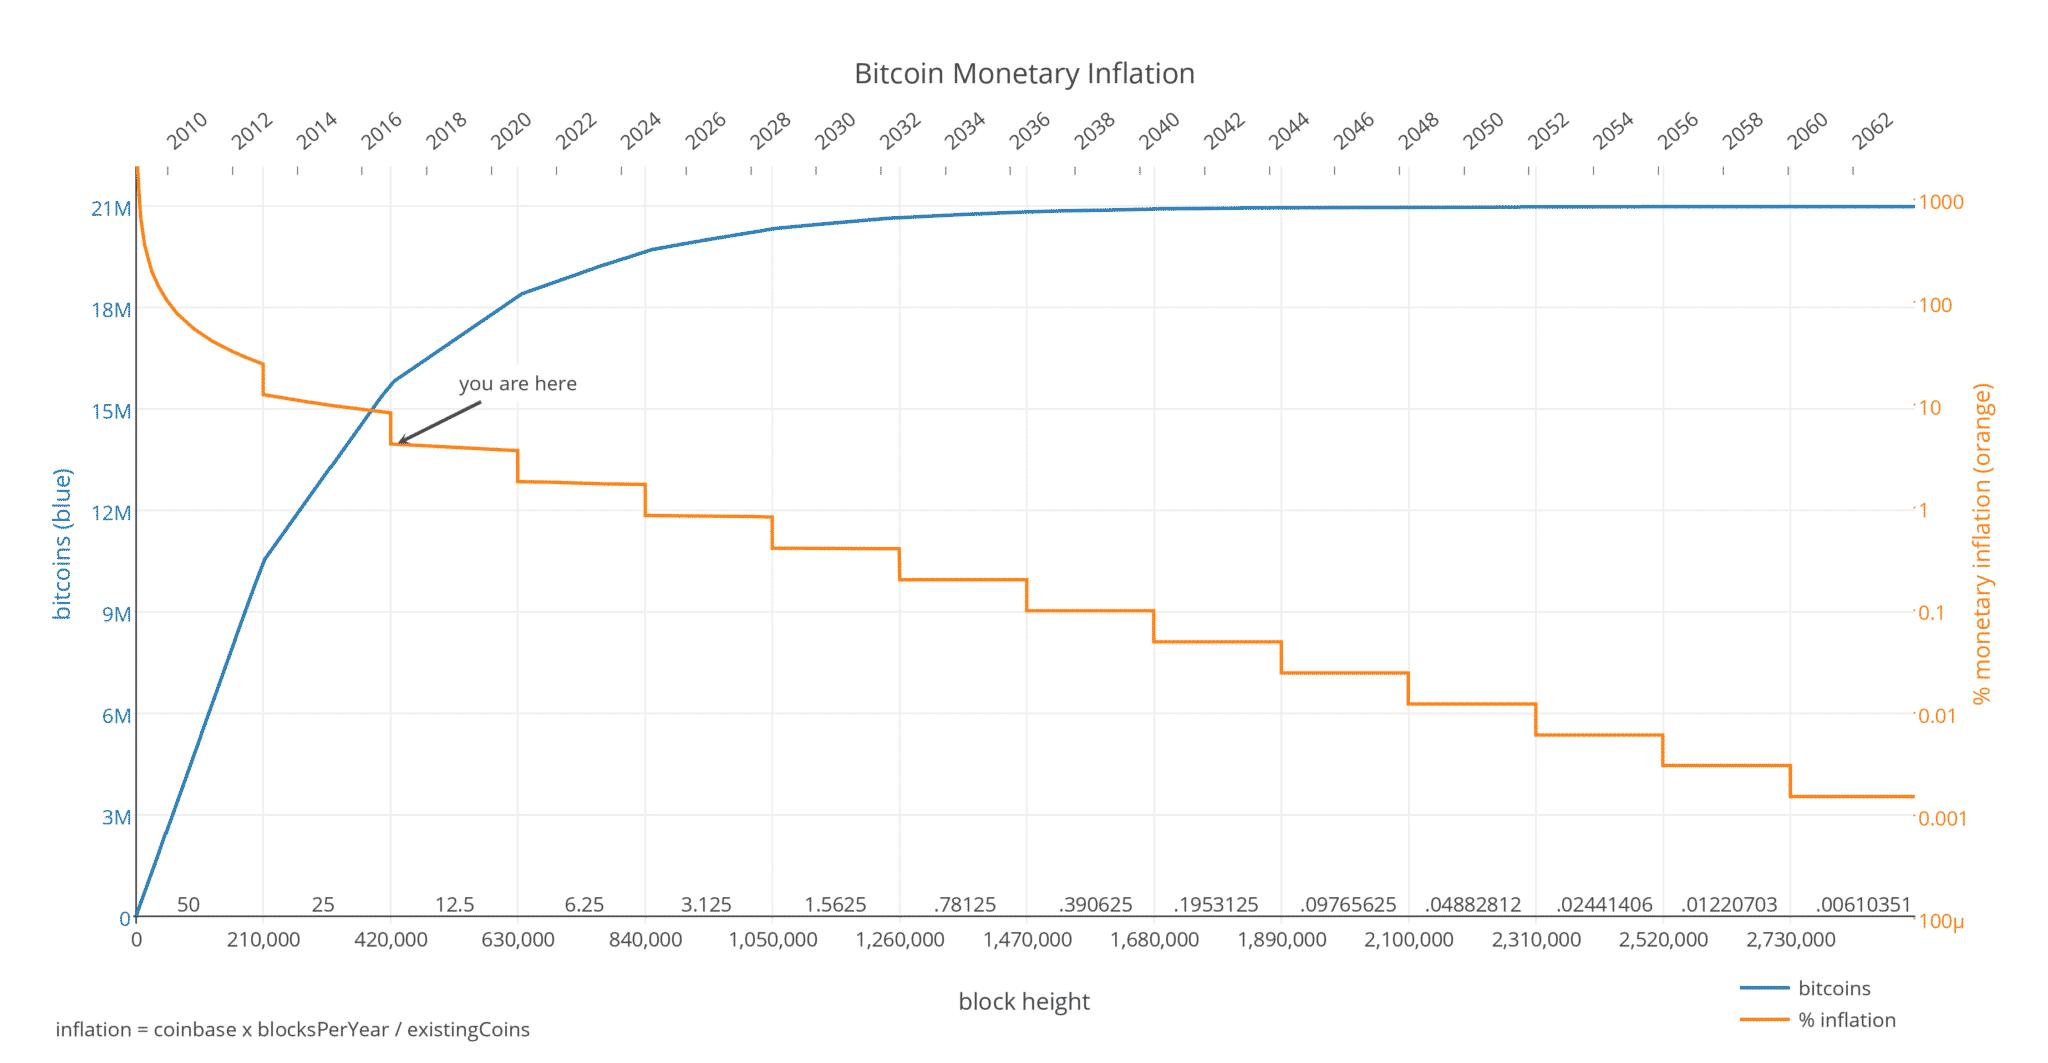 bitcoin inflation halving